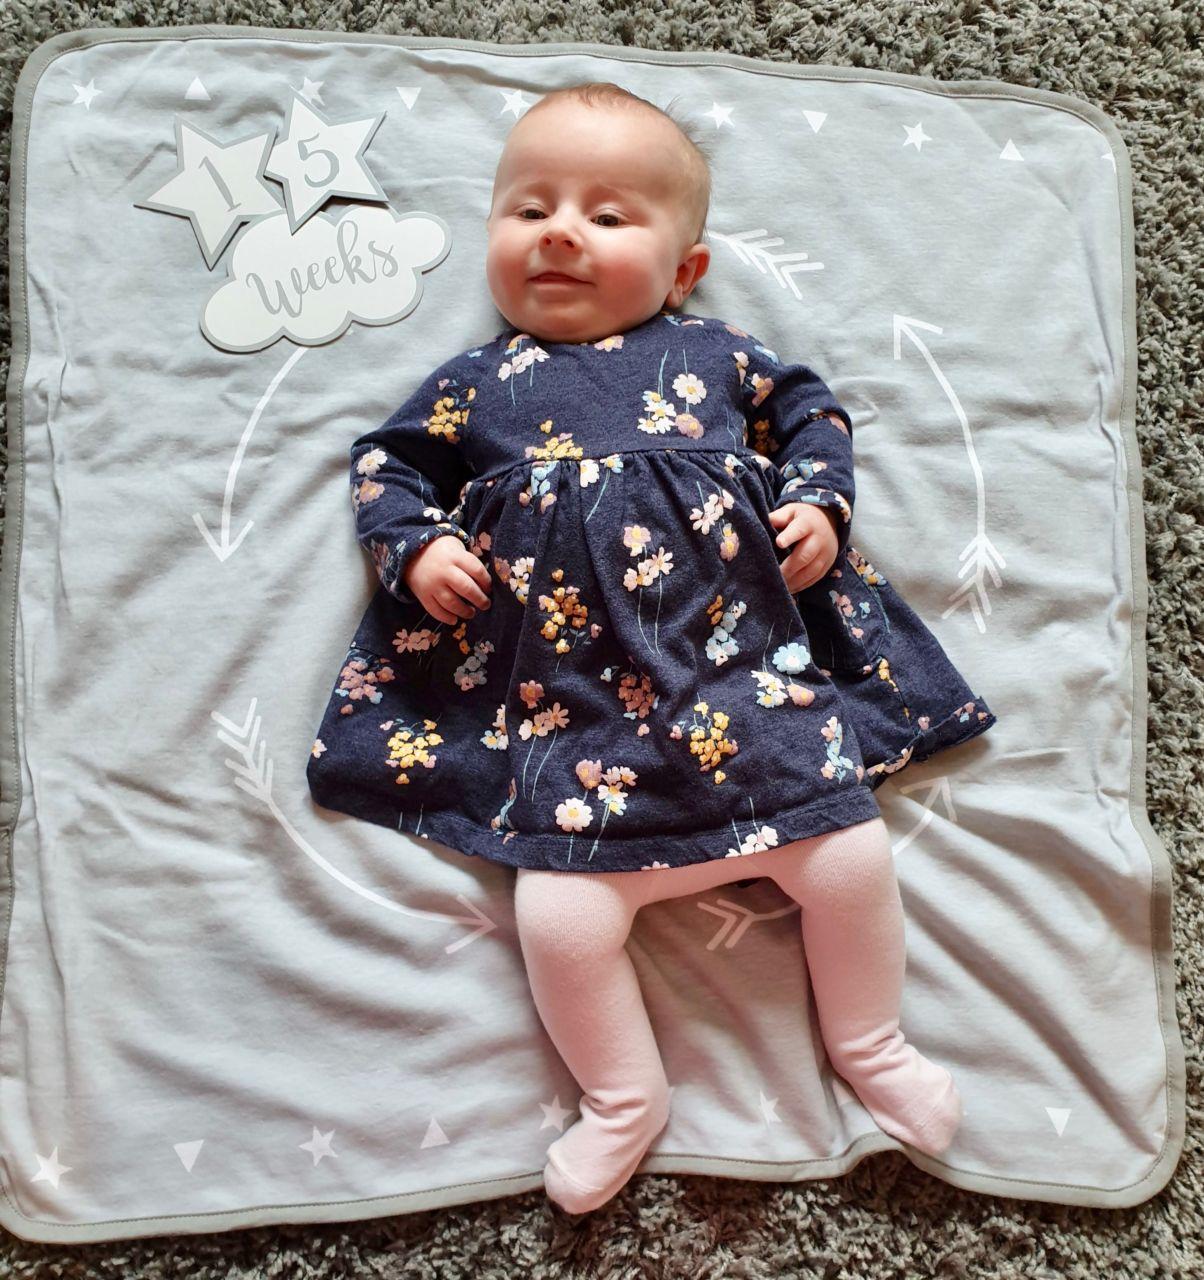 Emmy at 4 months